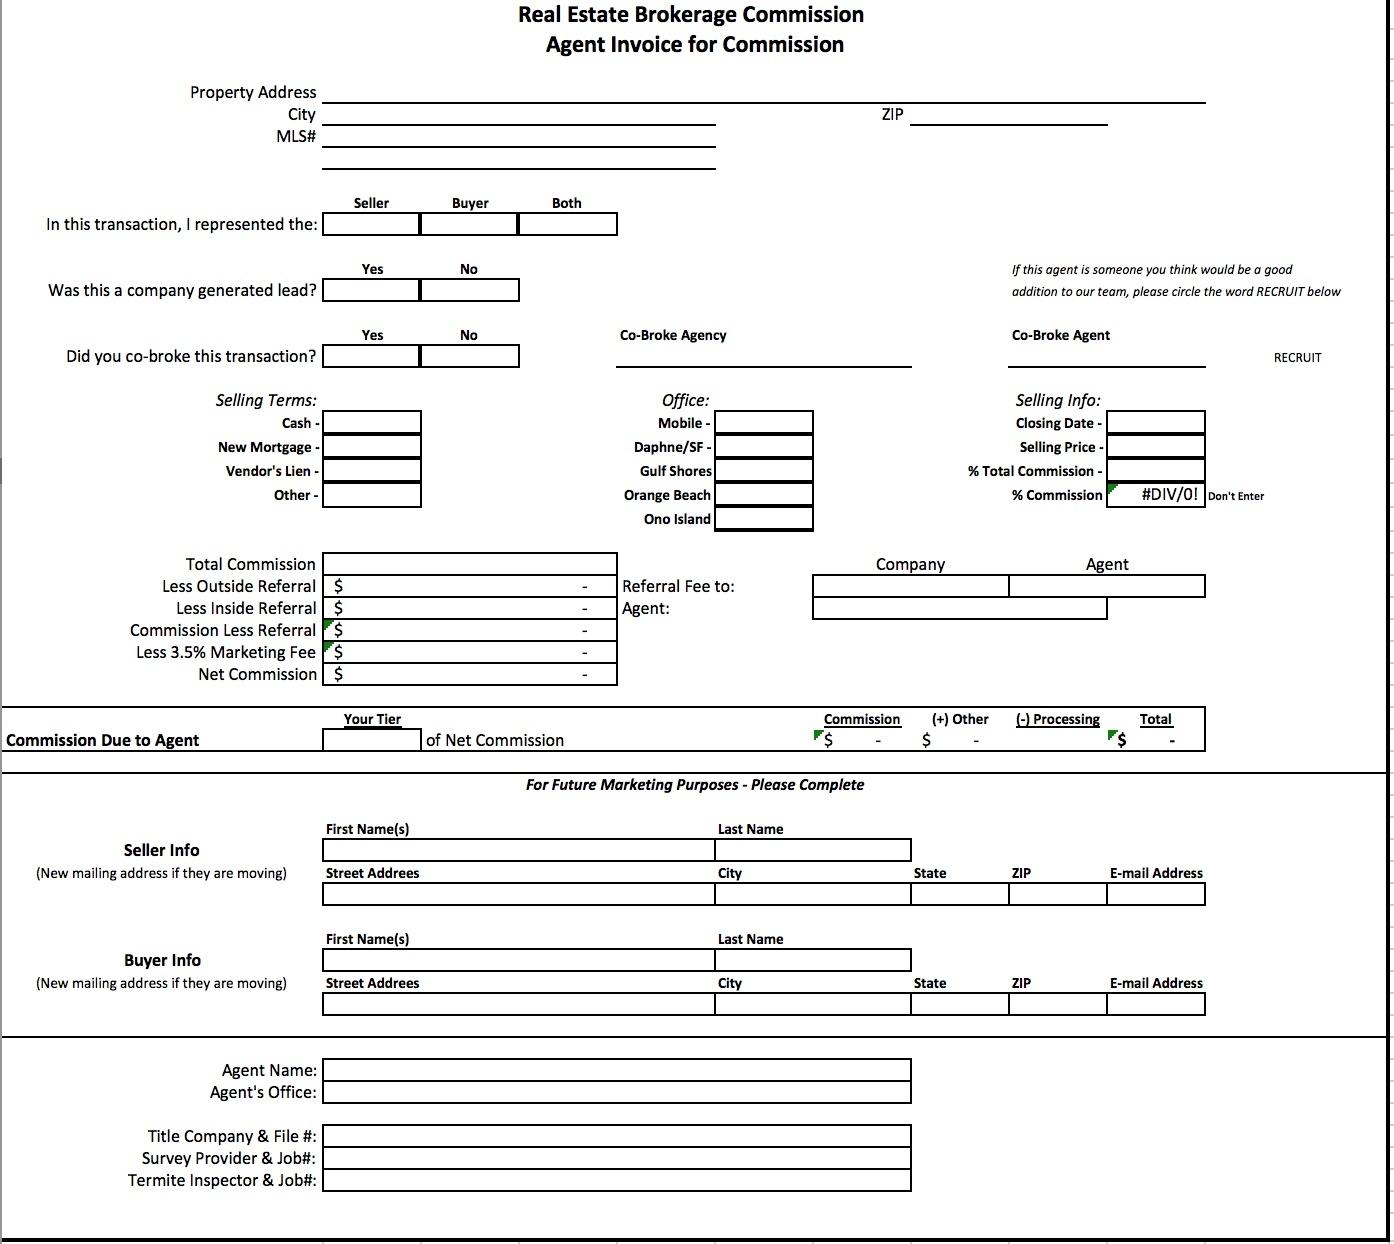 free real estate brokerage commission invoice template excel commission invoice template